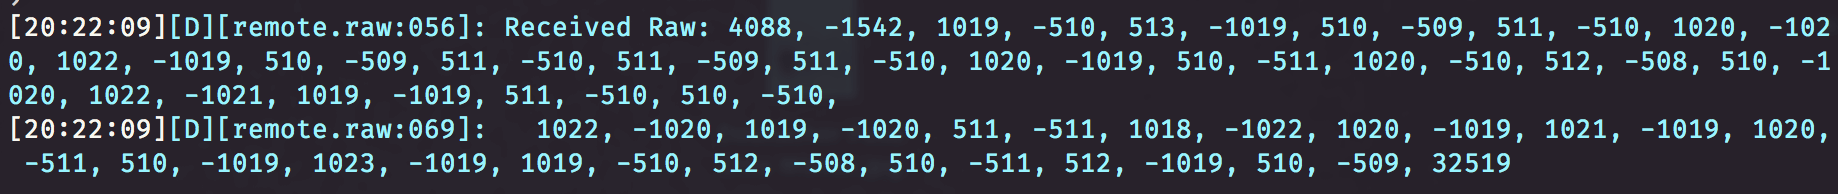 https://d33wubrfki0l68.cloudfront.net/d5ebcdca7be3ac33efc6ac07ab7e3dd7e9e40304/53e1c/_images/rf_receiver-log_raw.png